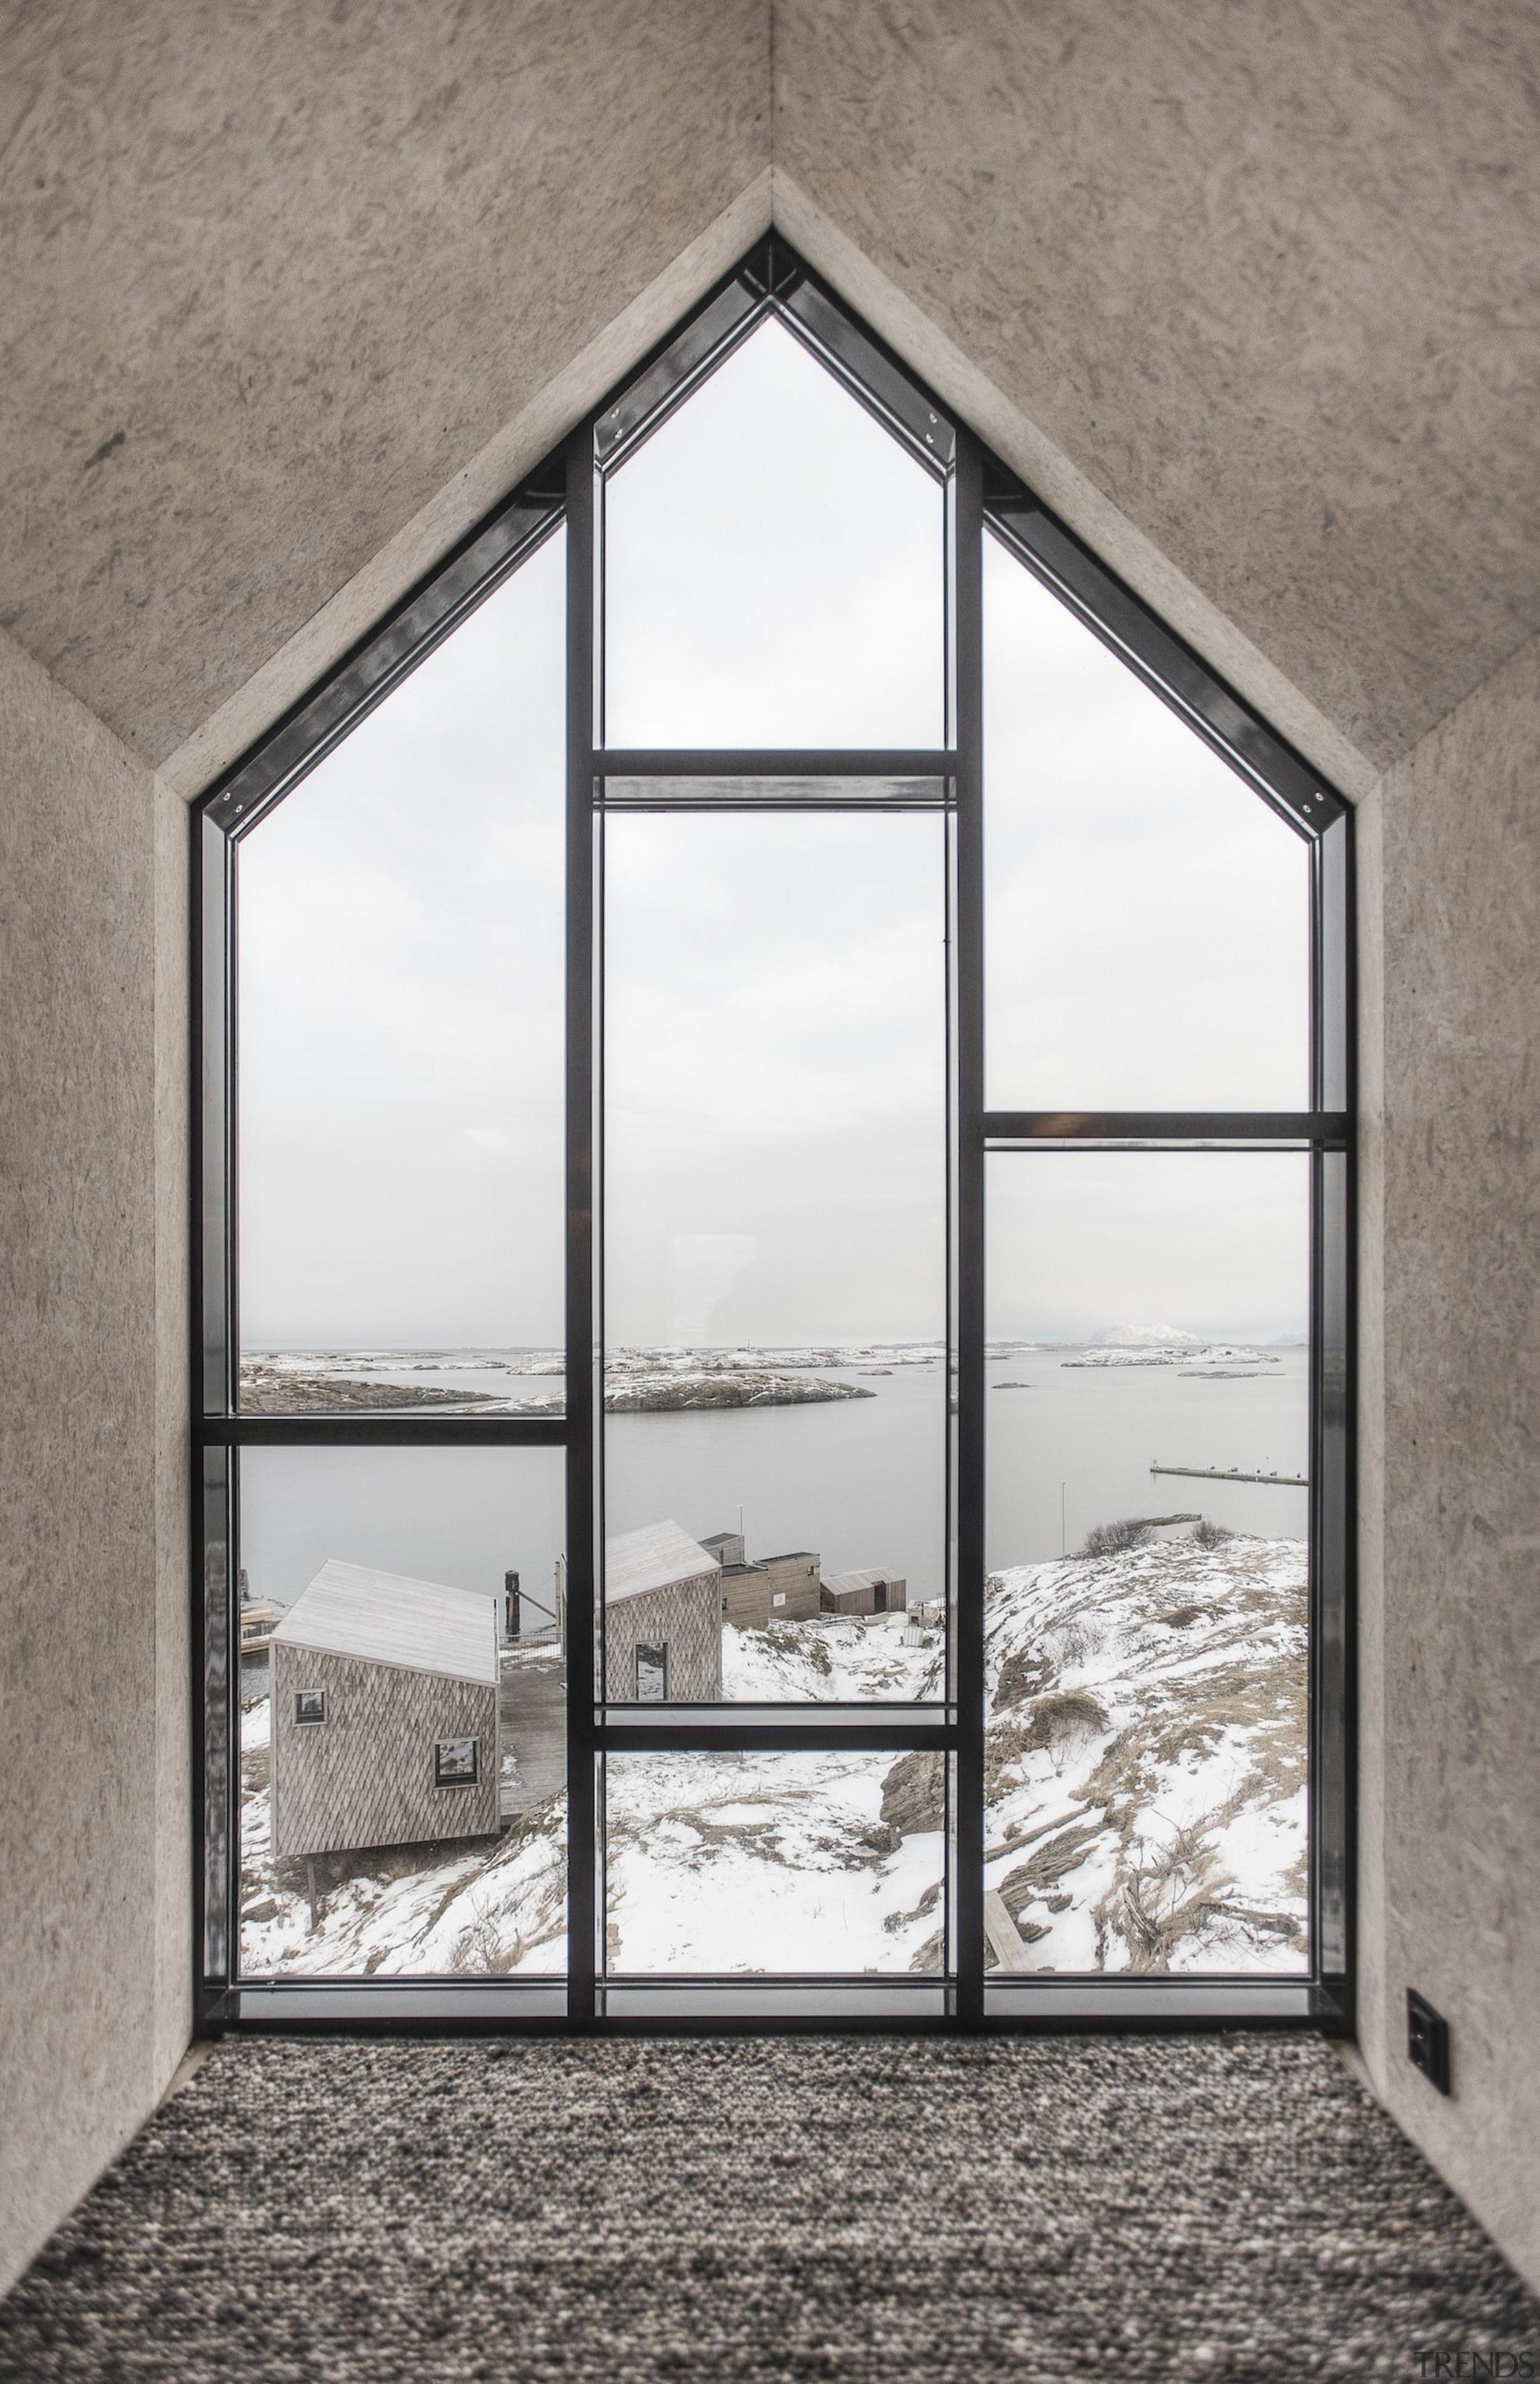 Architect: TYIN tegnestue ArchitectsPhotographer: Pasi Aalto / architecture, daylighting, home, house, window, gray, white